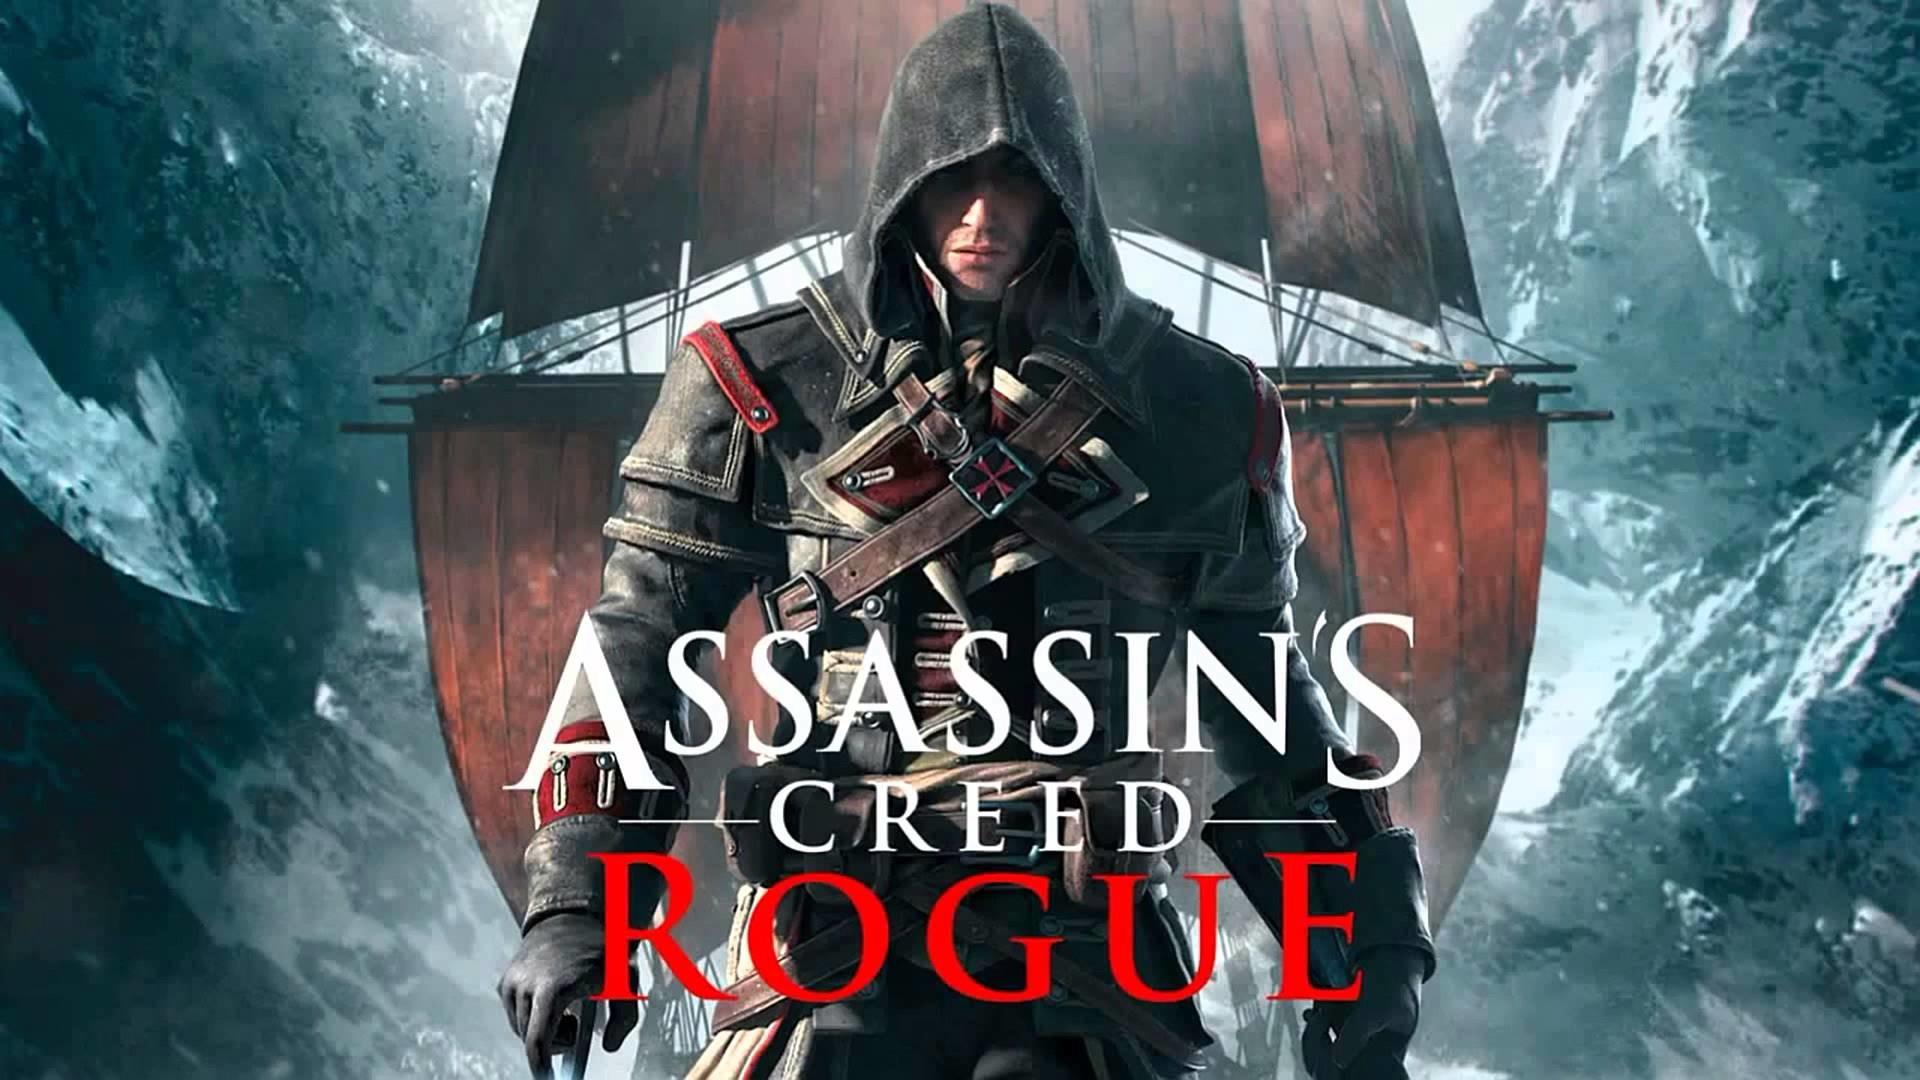 Assassin's Creed Rogue Wallpapers HD   Assassins creed wallpaper   Assassins  creed Story   #19